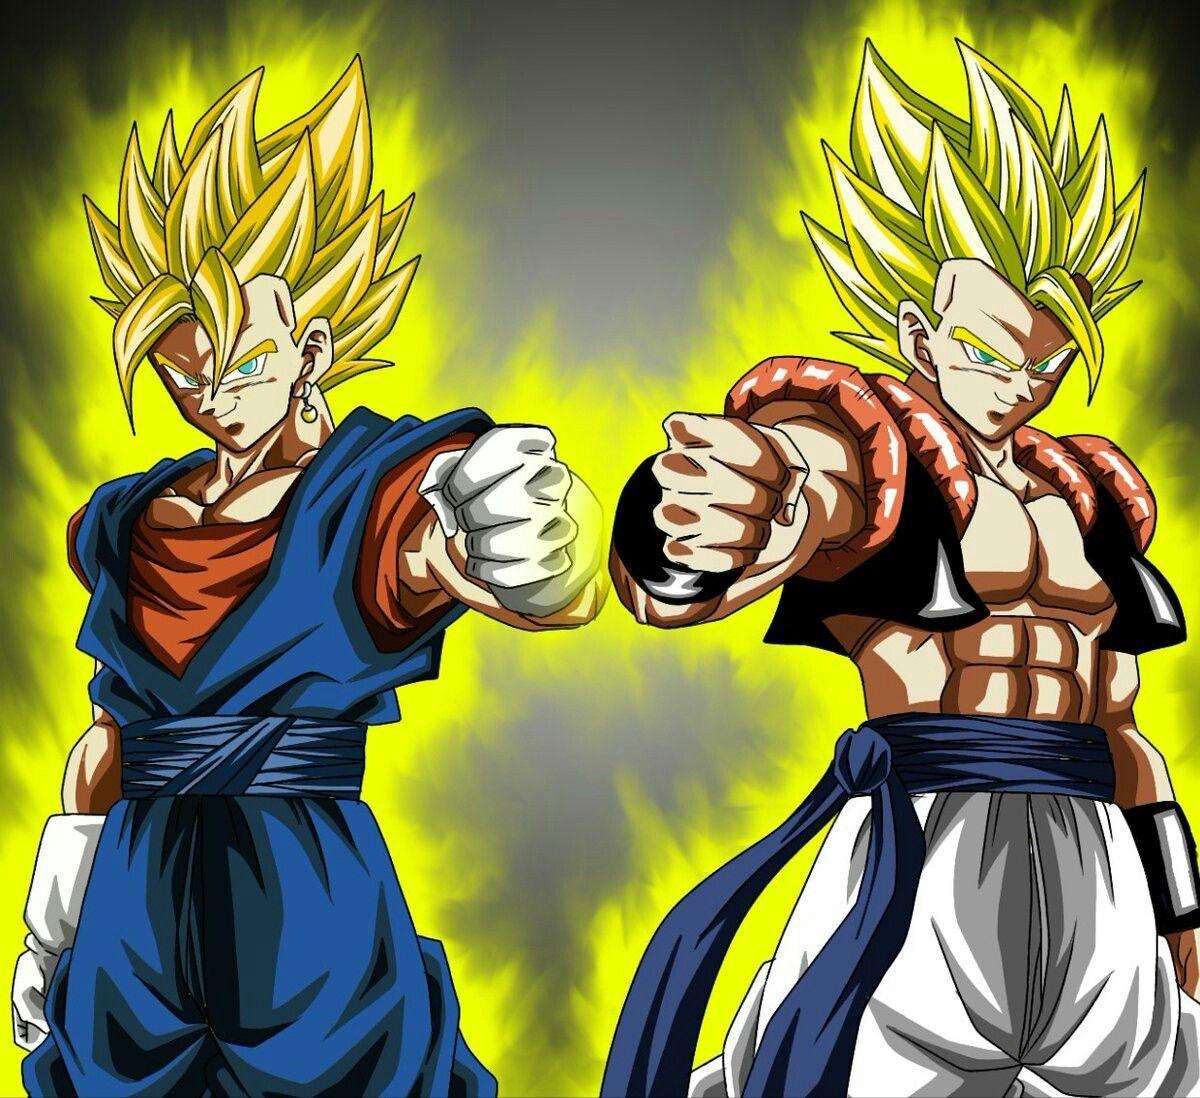 Vegetto Gogeta Ssj Personajes De Goku Personajes De Dragon Ball Vegetto Y Gogeta